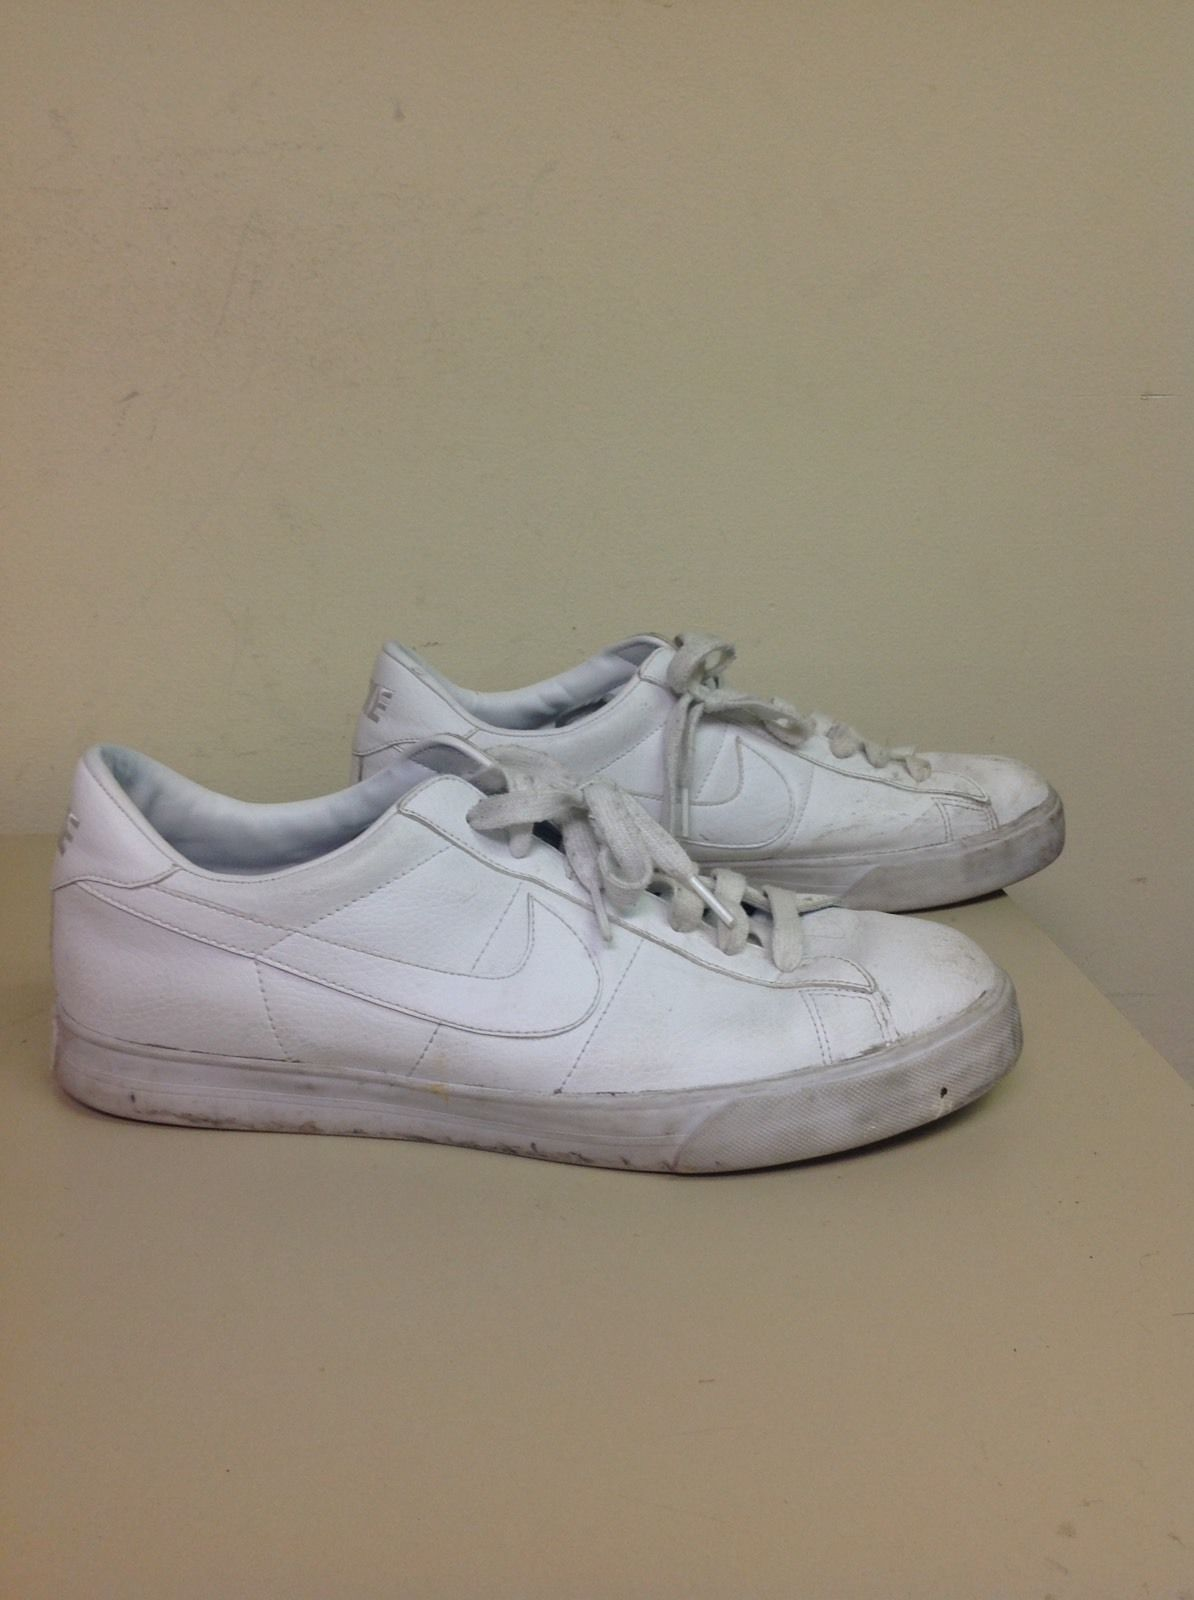 Nike Sweet Classic Leather White MENS SHOES sz 12 (318333 114) Walking Tennis